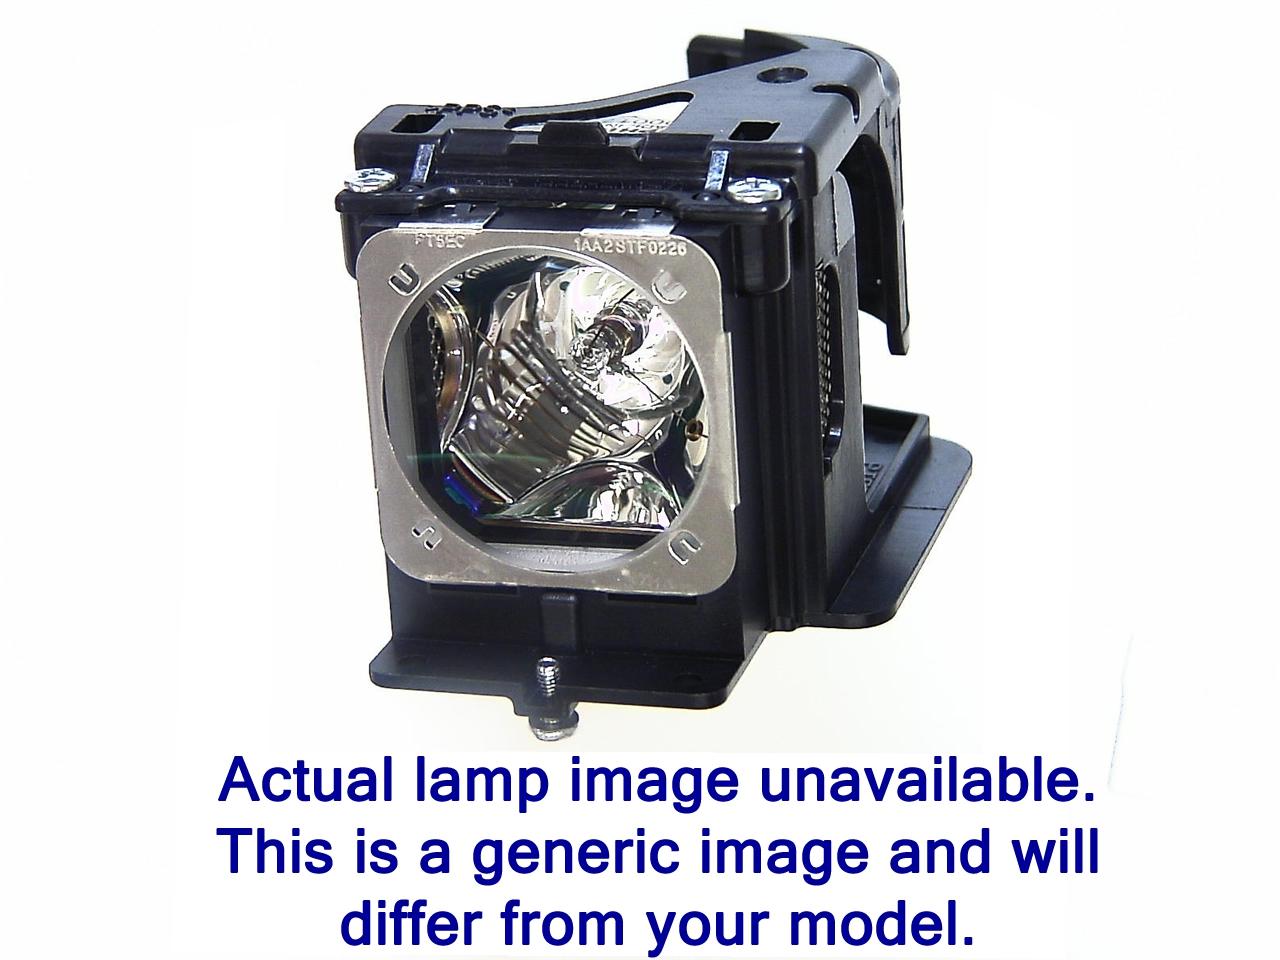 Diamond Lámpara For UTAX DXL 5021 Proyector.